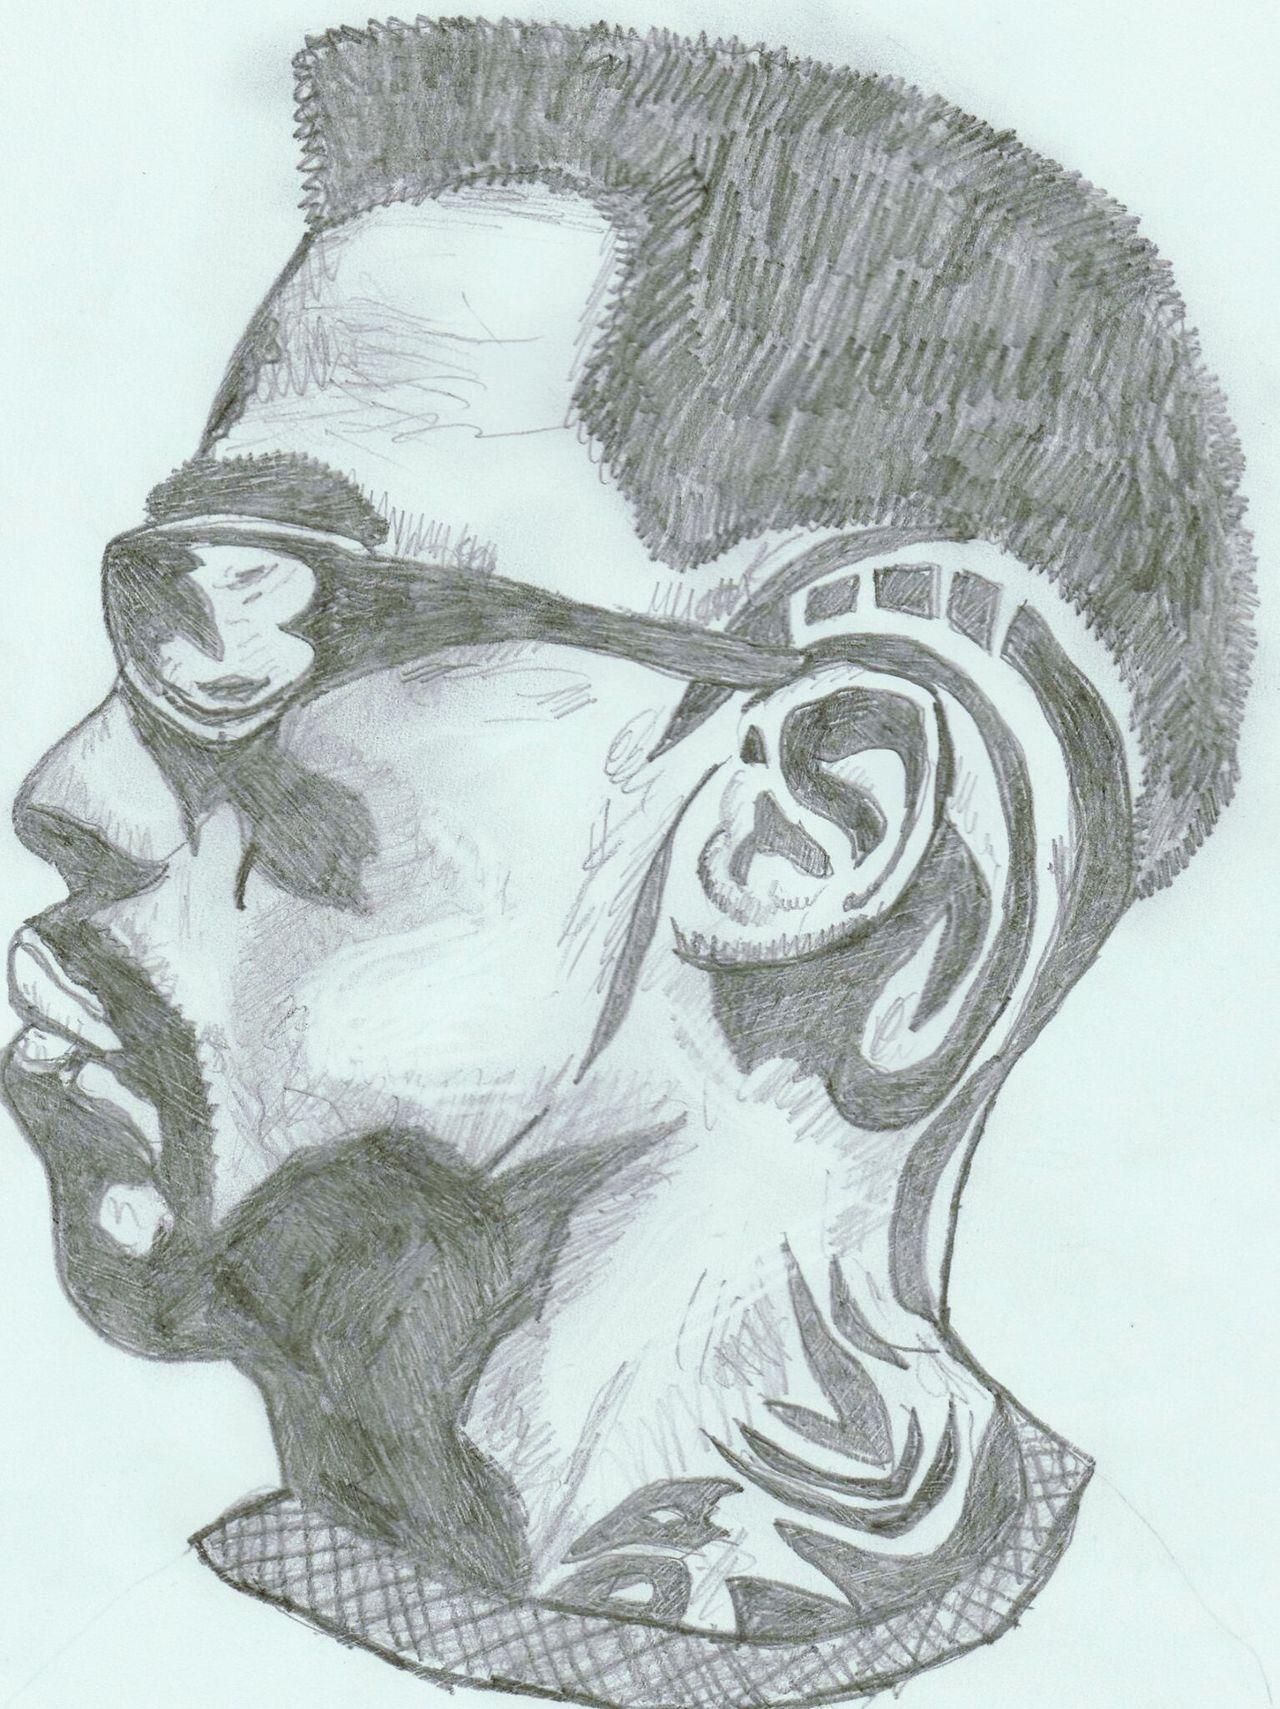 Pencil Drawing Human Body Part Men Drawing - Activity Human Hand People